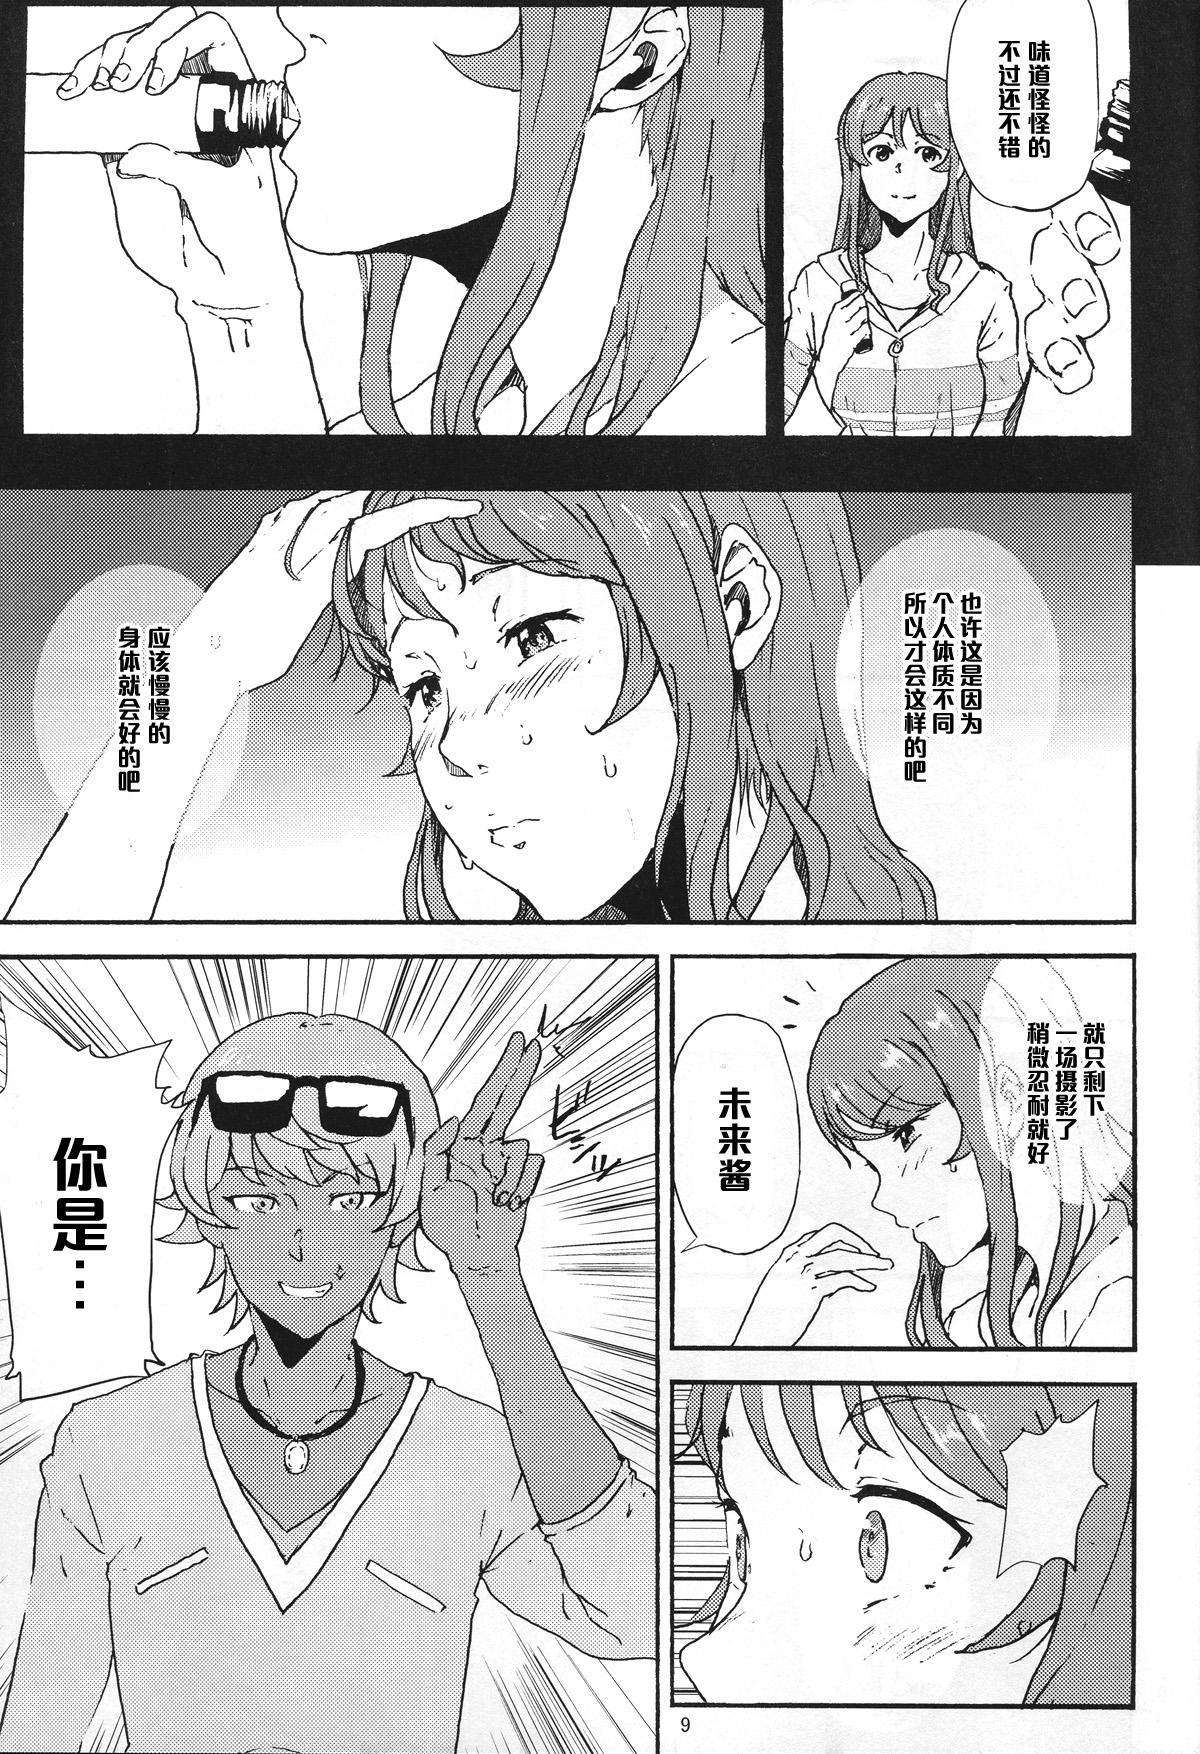 Mirai-chan ga Sandaime SGOCK no Leader ni Damasare Yarechau Hon 8